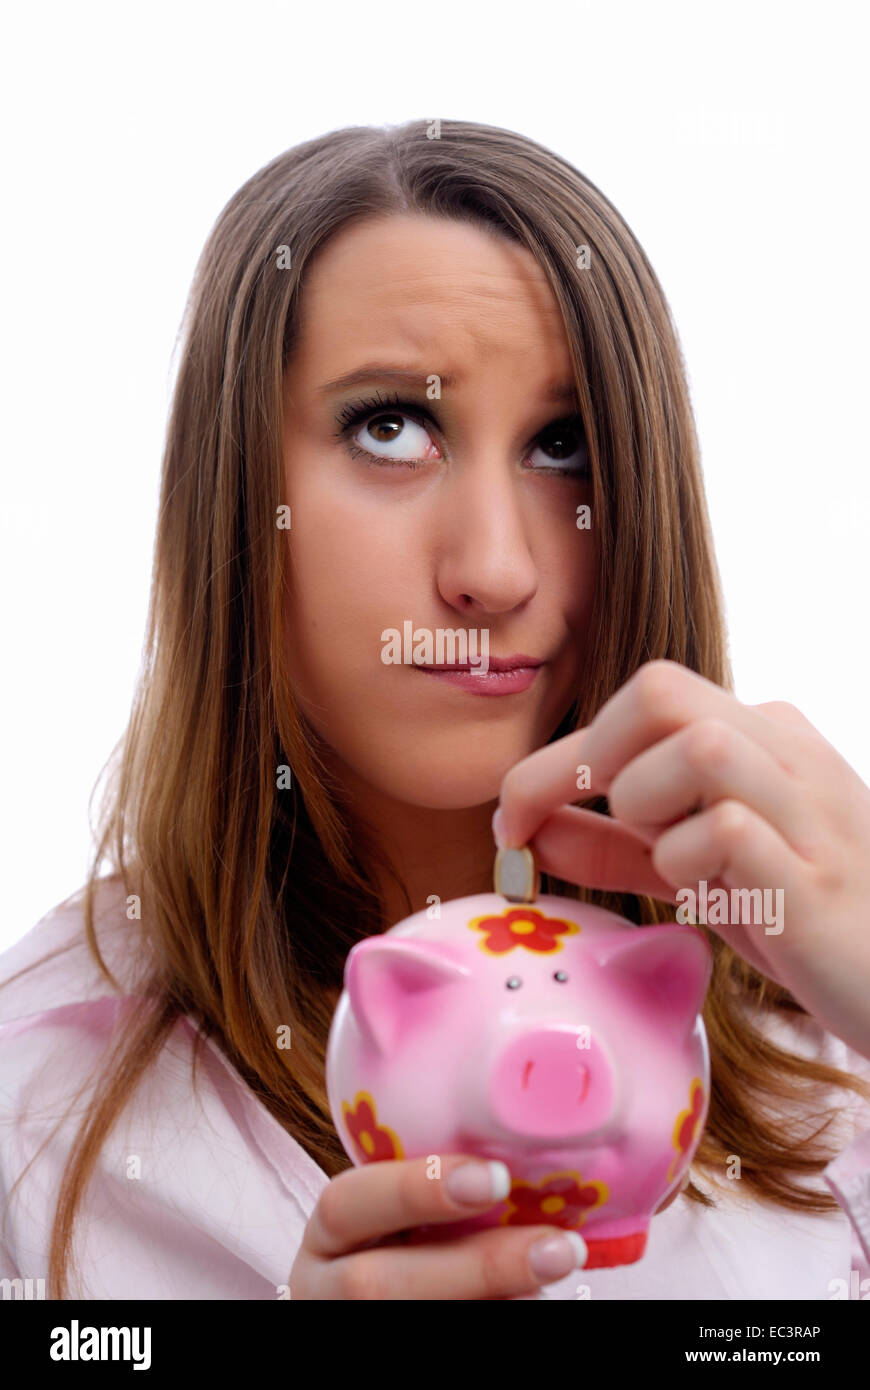 Woman holding Piggy Bank - Stock Image